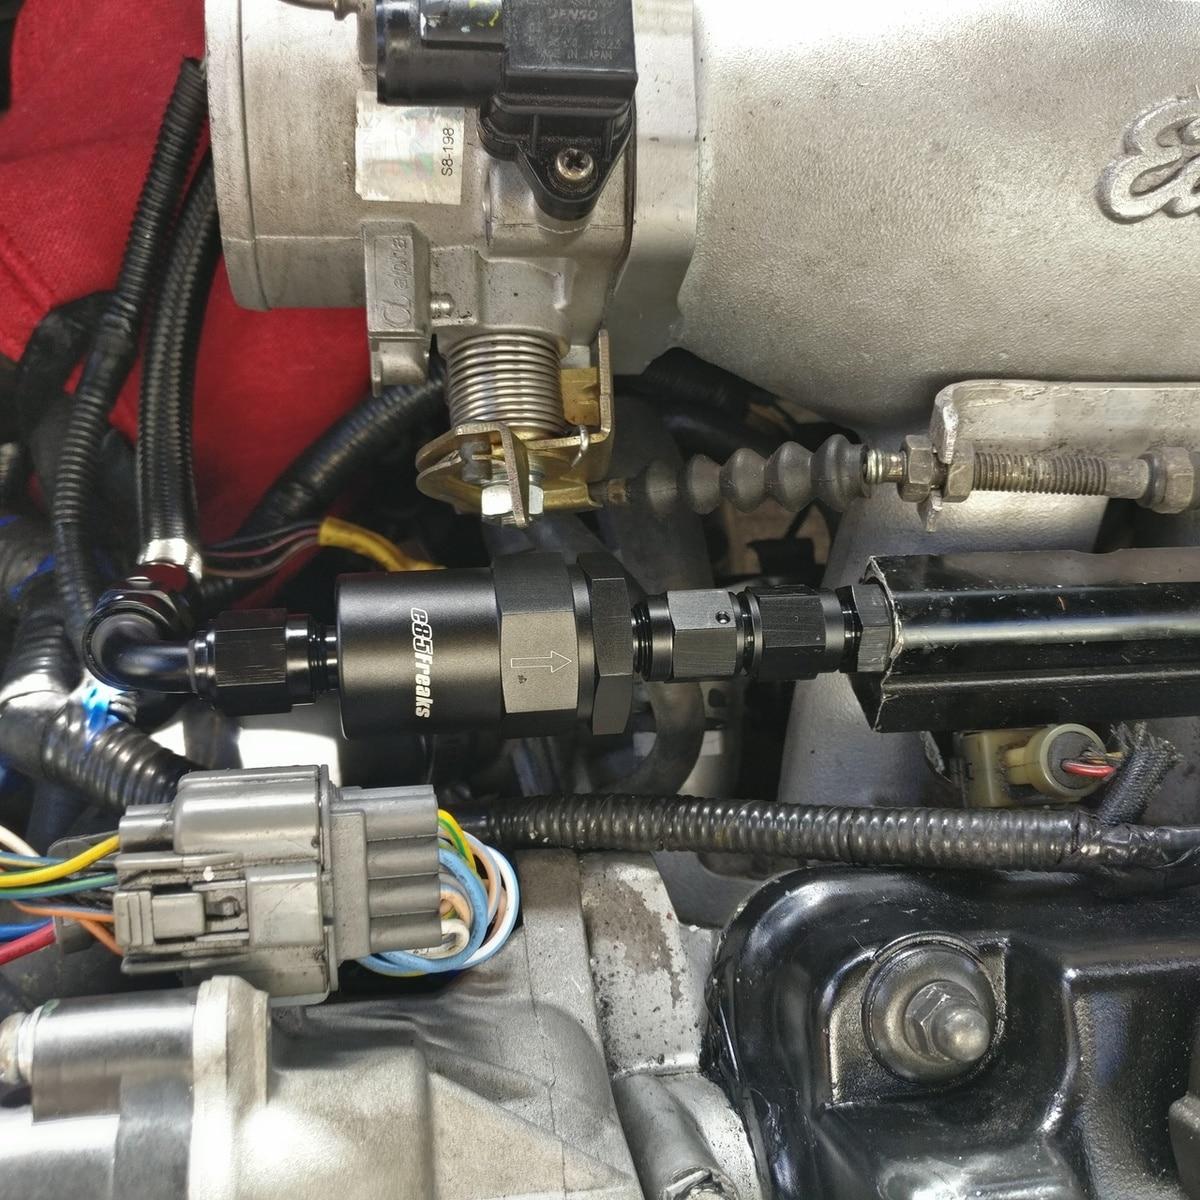 honda civic dx fuel filter location dr 4006  fuel filter 1991 honda civic si hatchback schematic wiring  fuel filter 1991 honda civic si